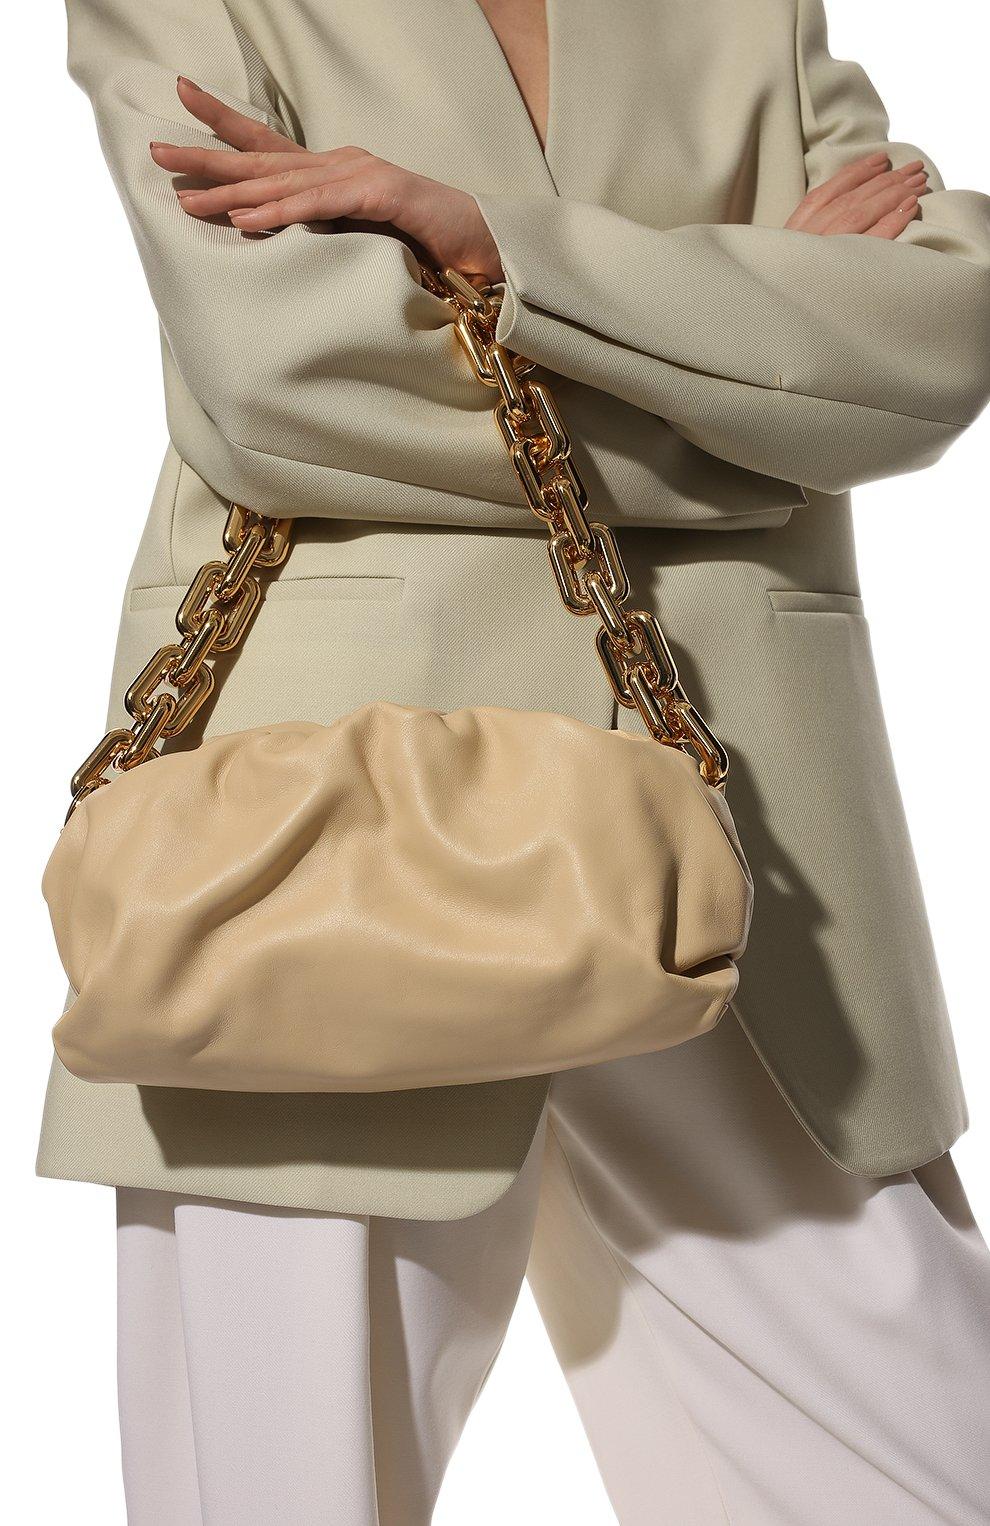 Женская сумка chain pouch BOTTEGA VENETA светло-бежевого цвета, арт. 620230/VCP40 | Фото 2